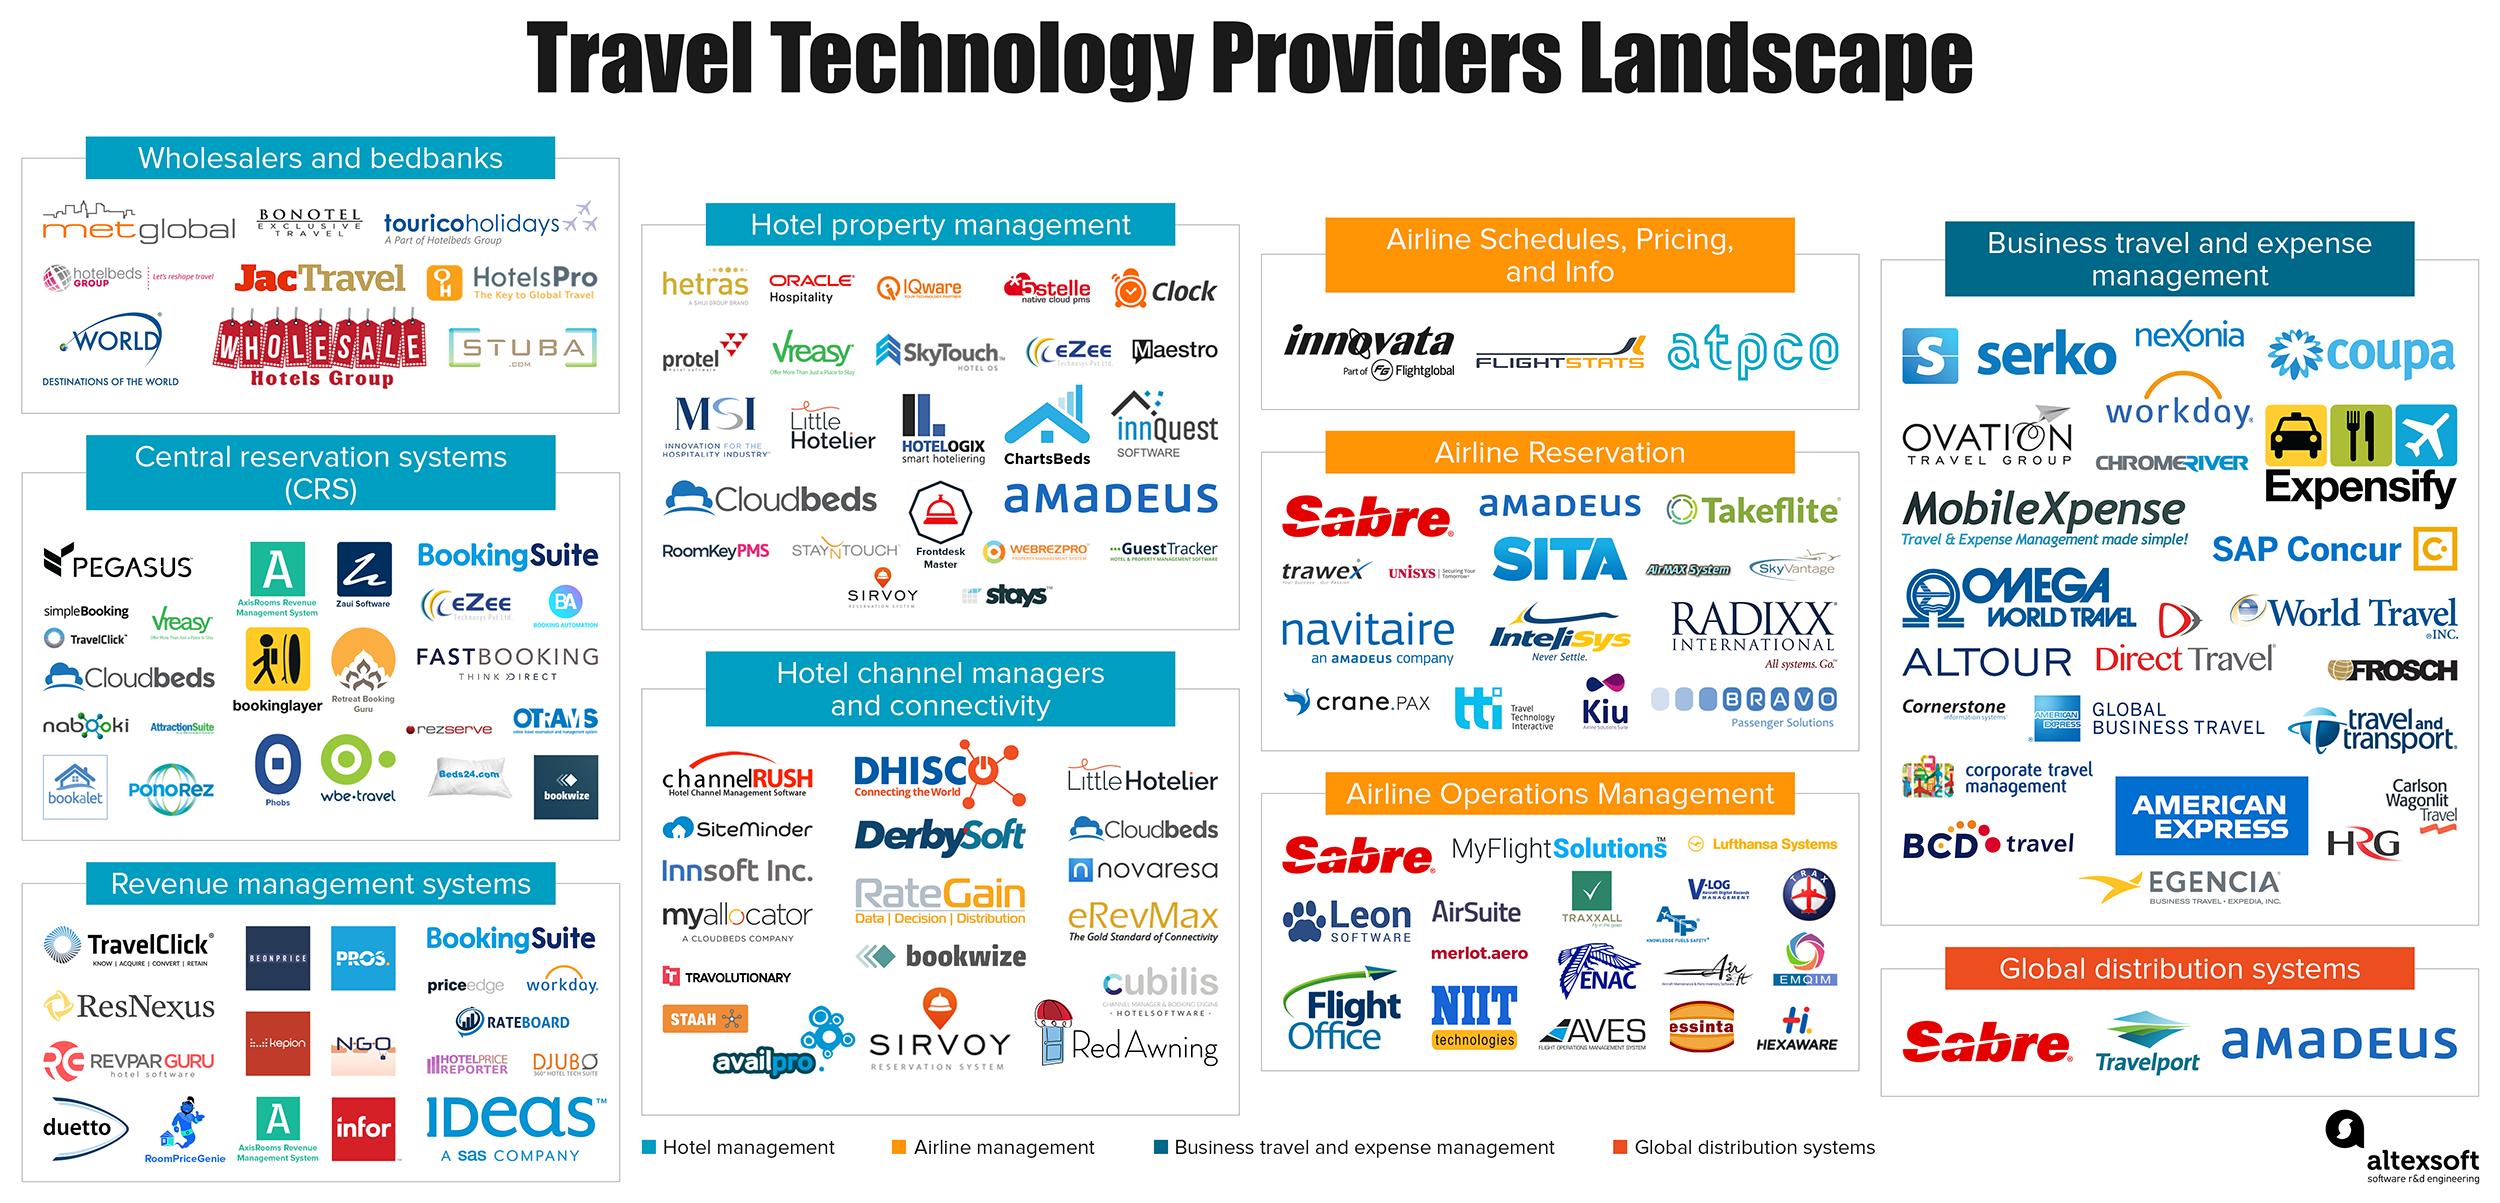 TravelTech landscape infographic